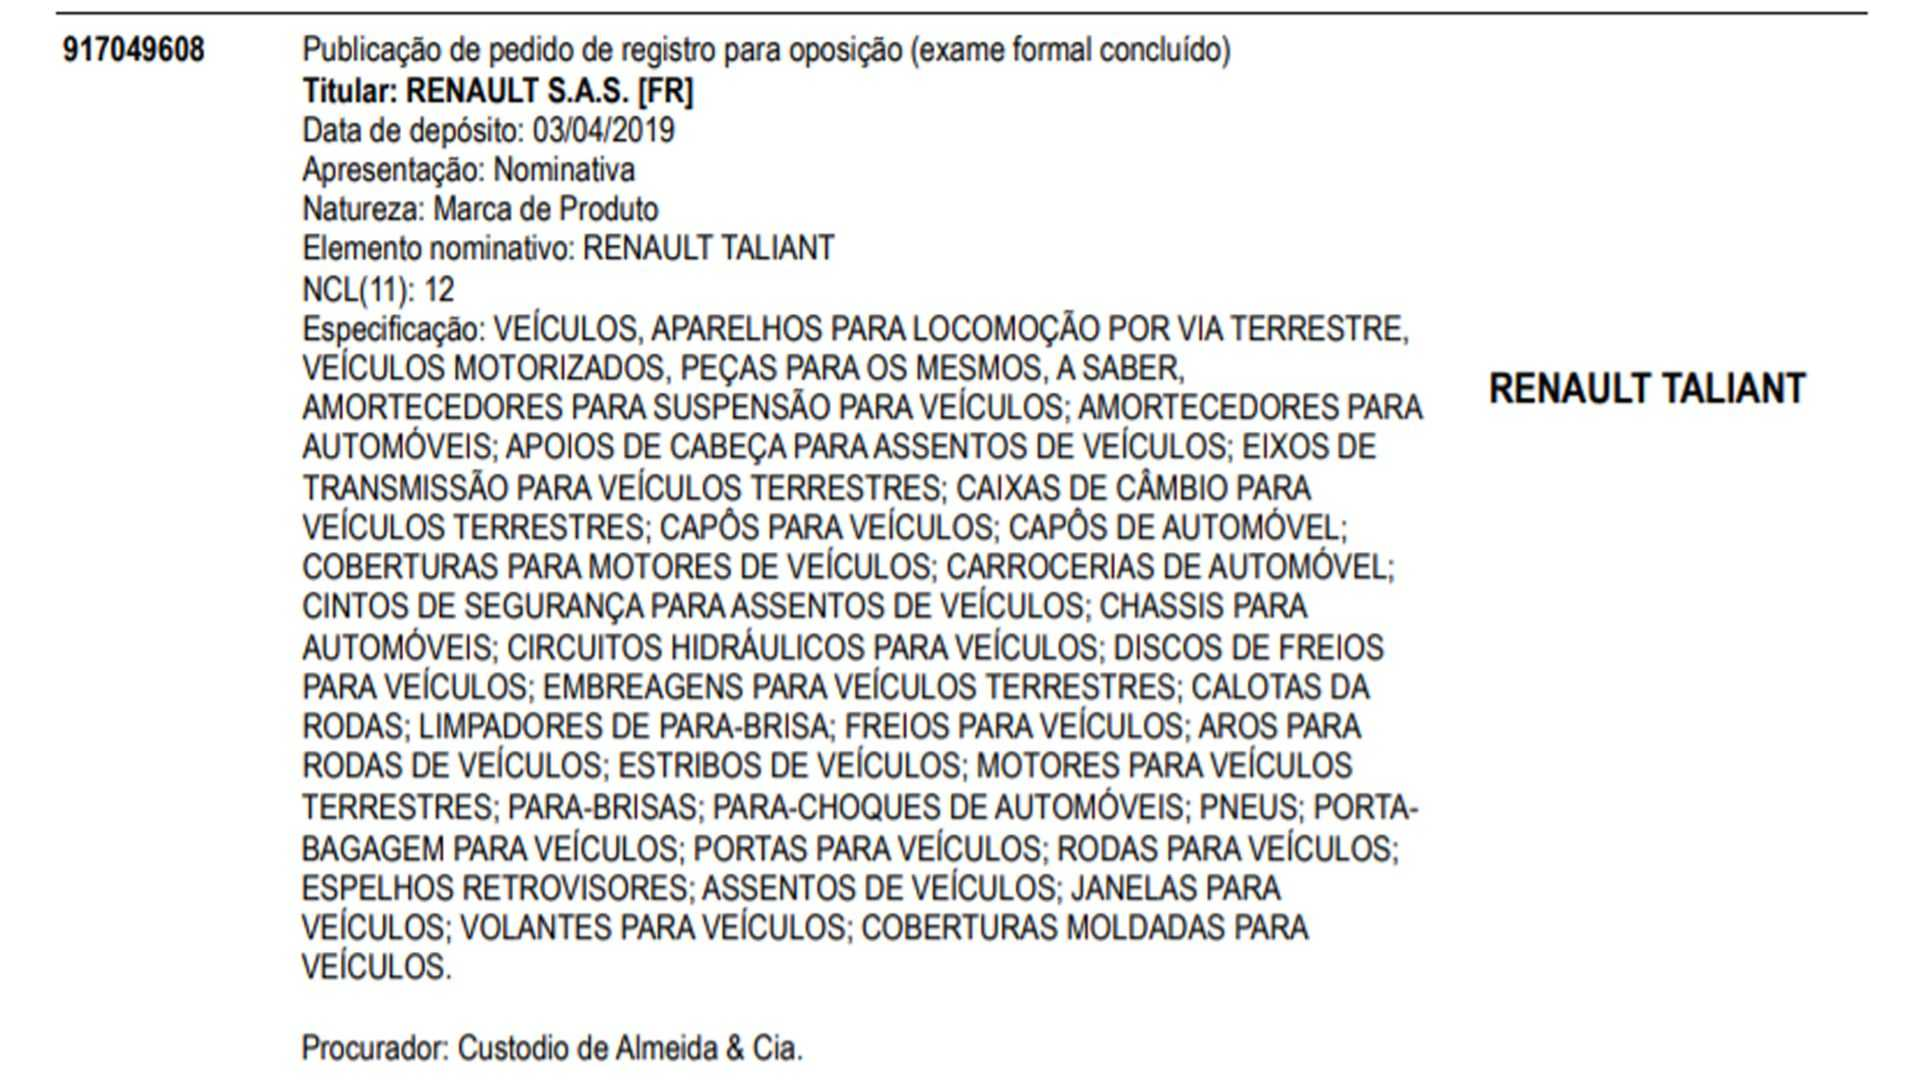 Renault Taliant patente características